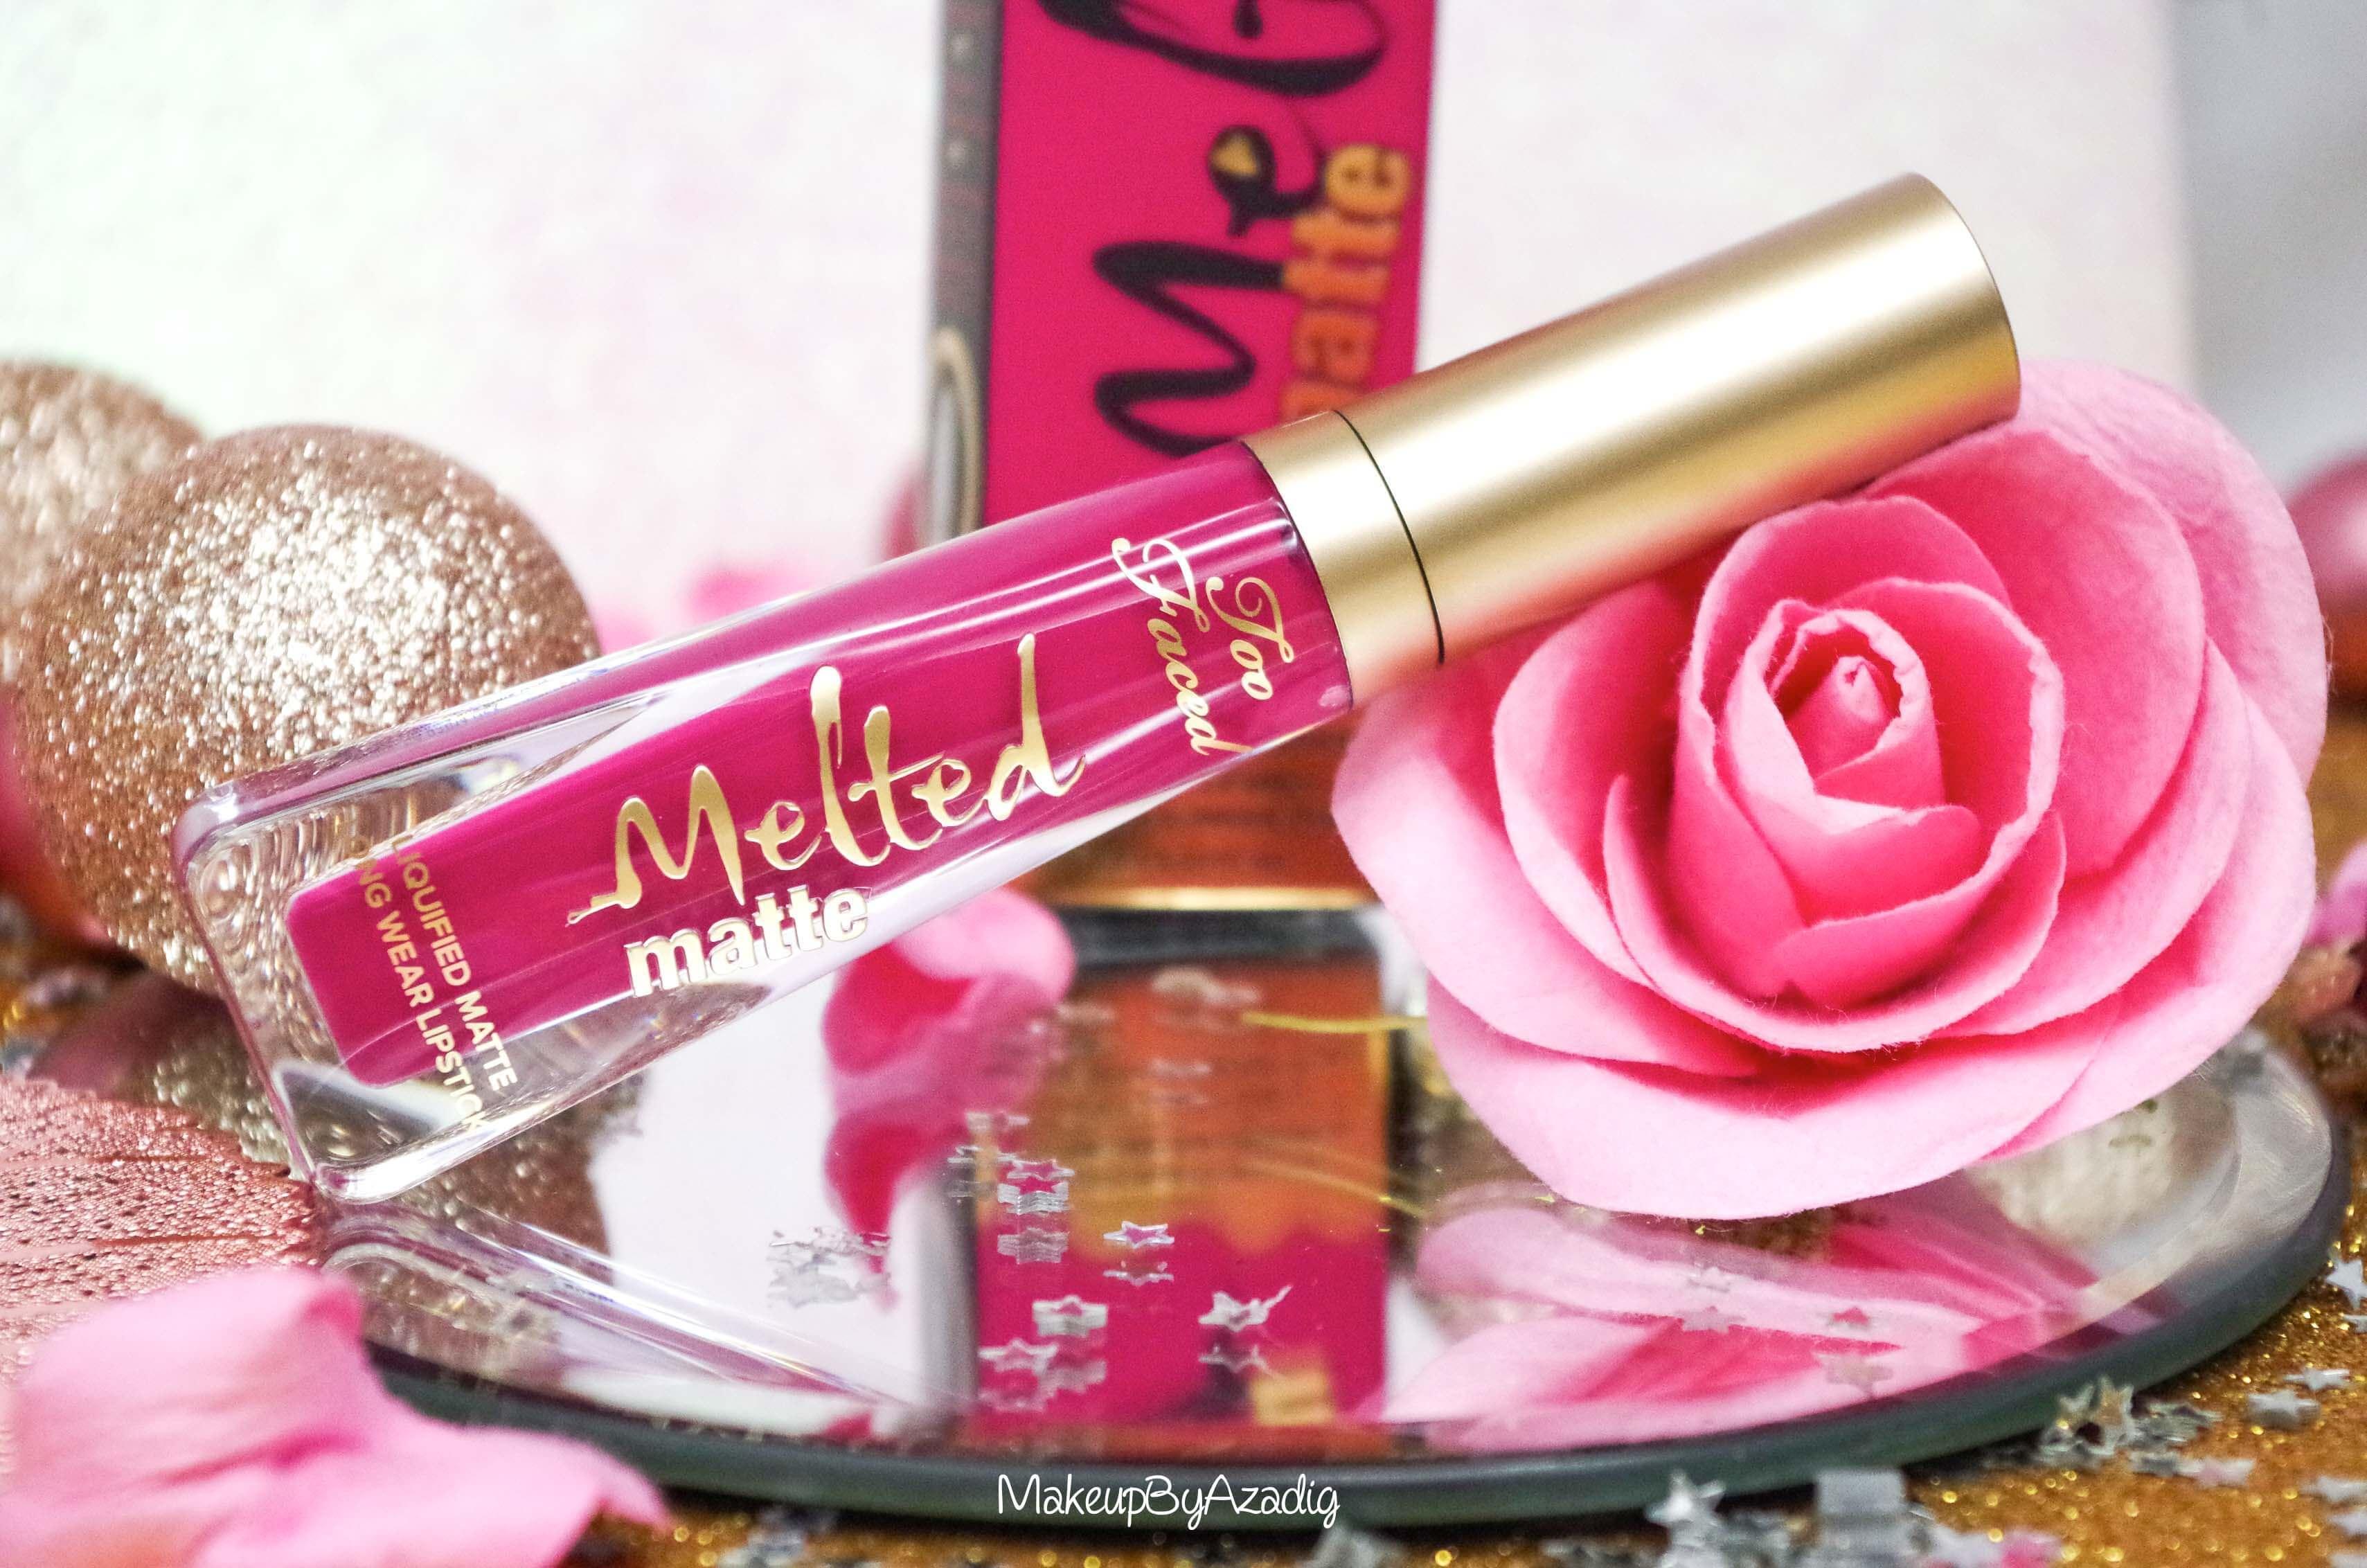 miniature-makeupbyazadig-melted-matte-queenb-bendandsnap-influencer-too-faced-rouge-levres-revue-avis-prix-sephora-paris-blog-liquide